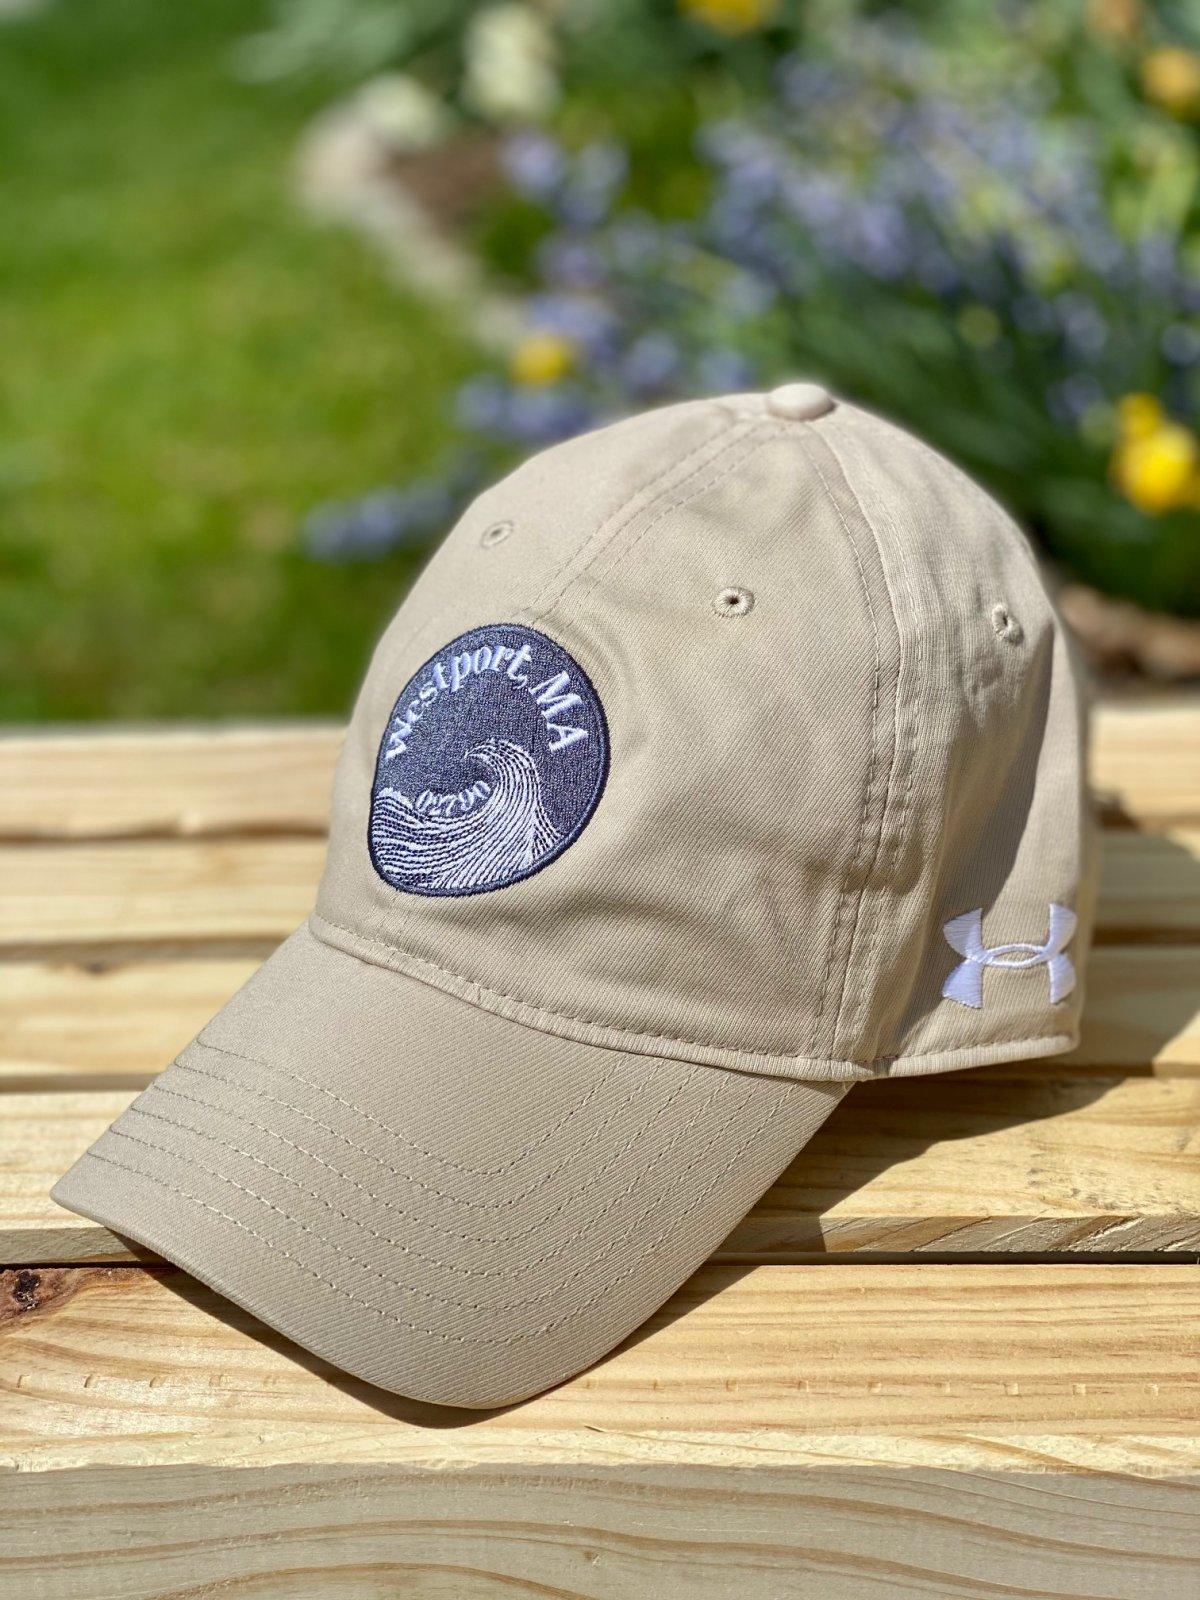 Under Armour Westport Wave Patch Hat - Khaki